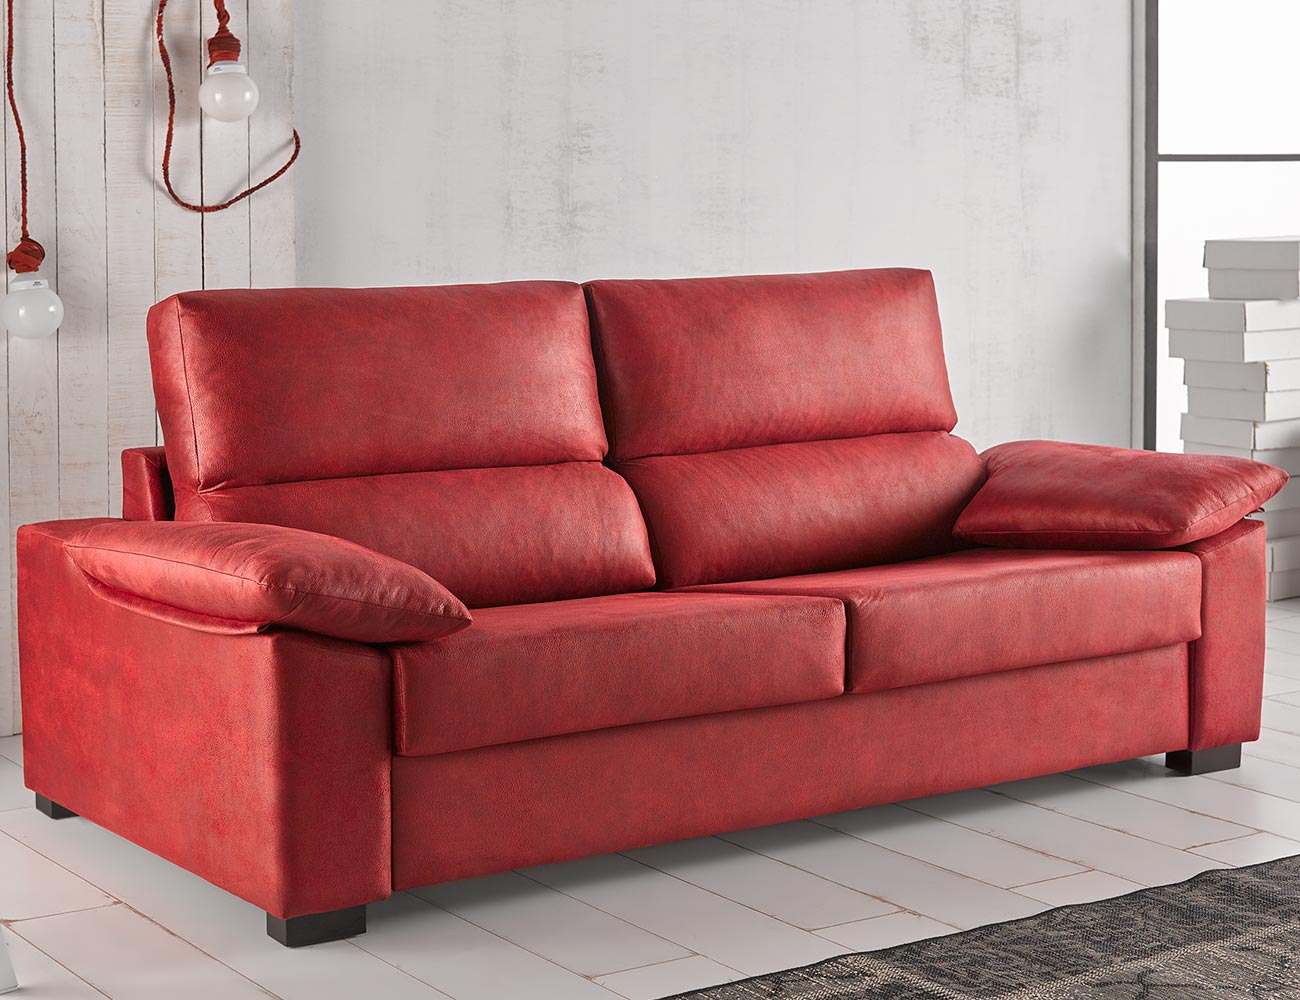 Sofa cama apertura italiano gran calidad leire rojo28